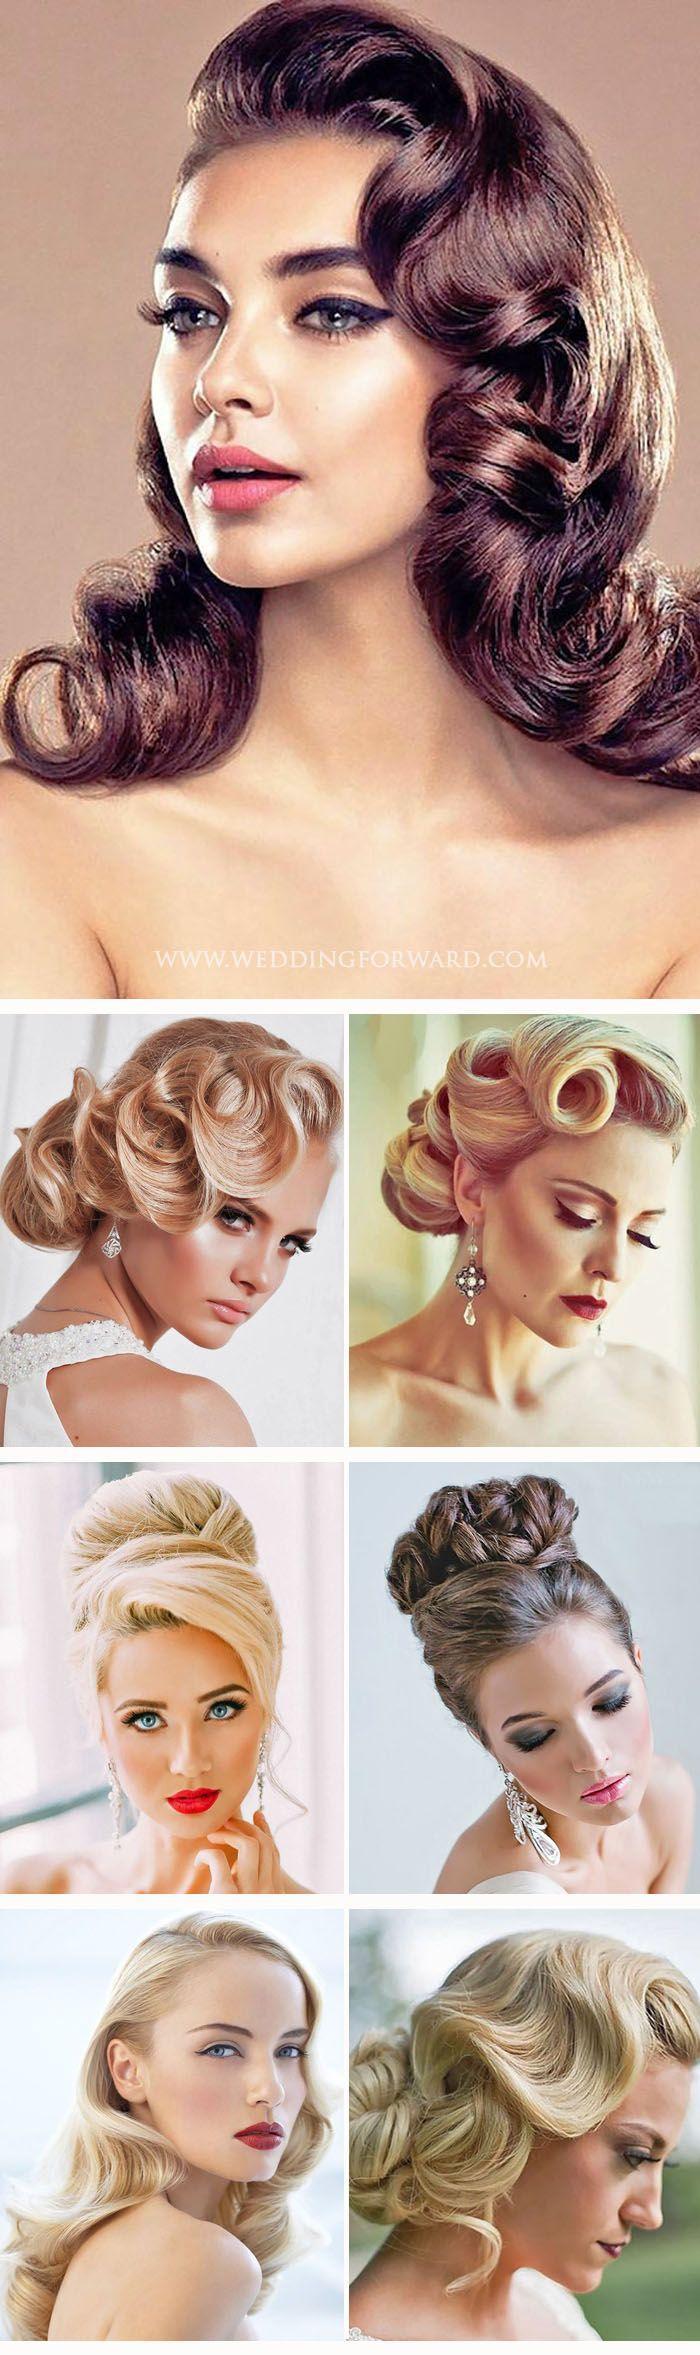 Boda - 27 Utterly Gorgeous Vintage Wedding Hairstyles